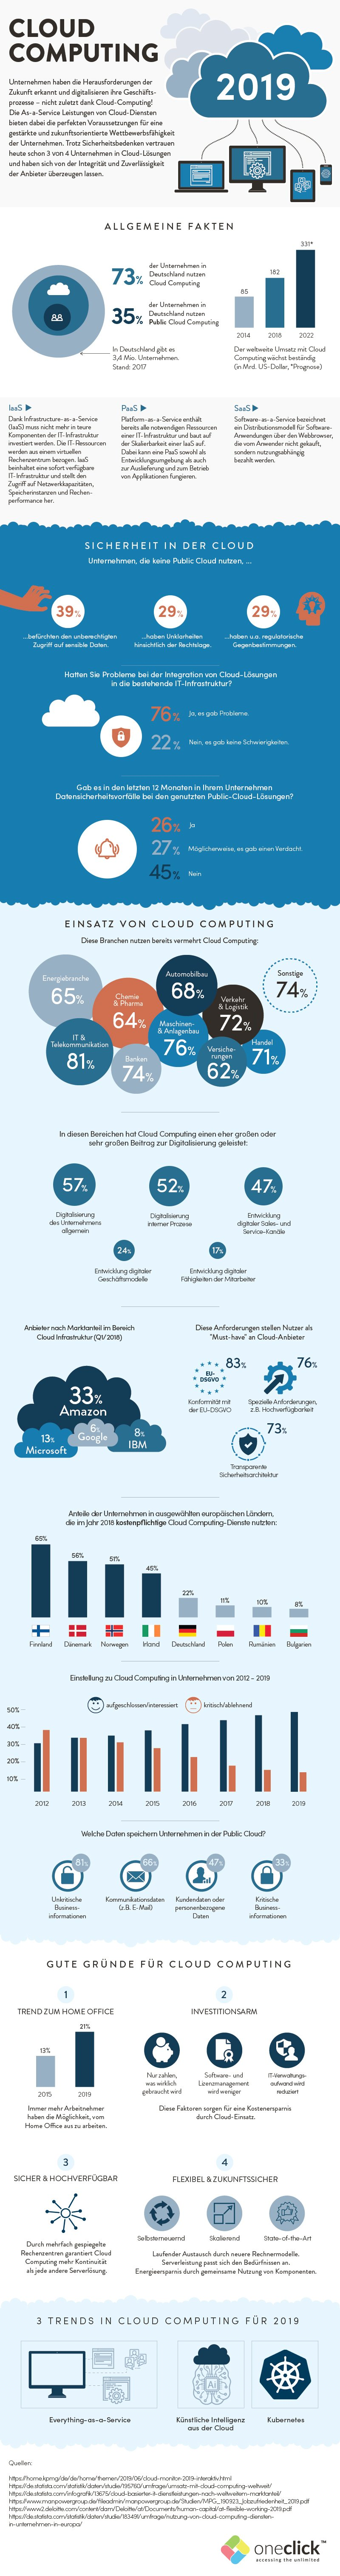 Cloud Computing aus unternehmerischer Sicht Platform as a Service (PaaS)-Software as Service (SaaS) Infrastructure as a Service (Iaas)